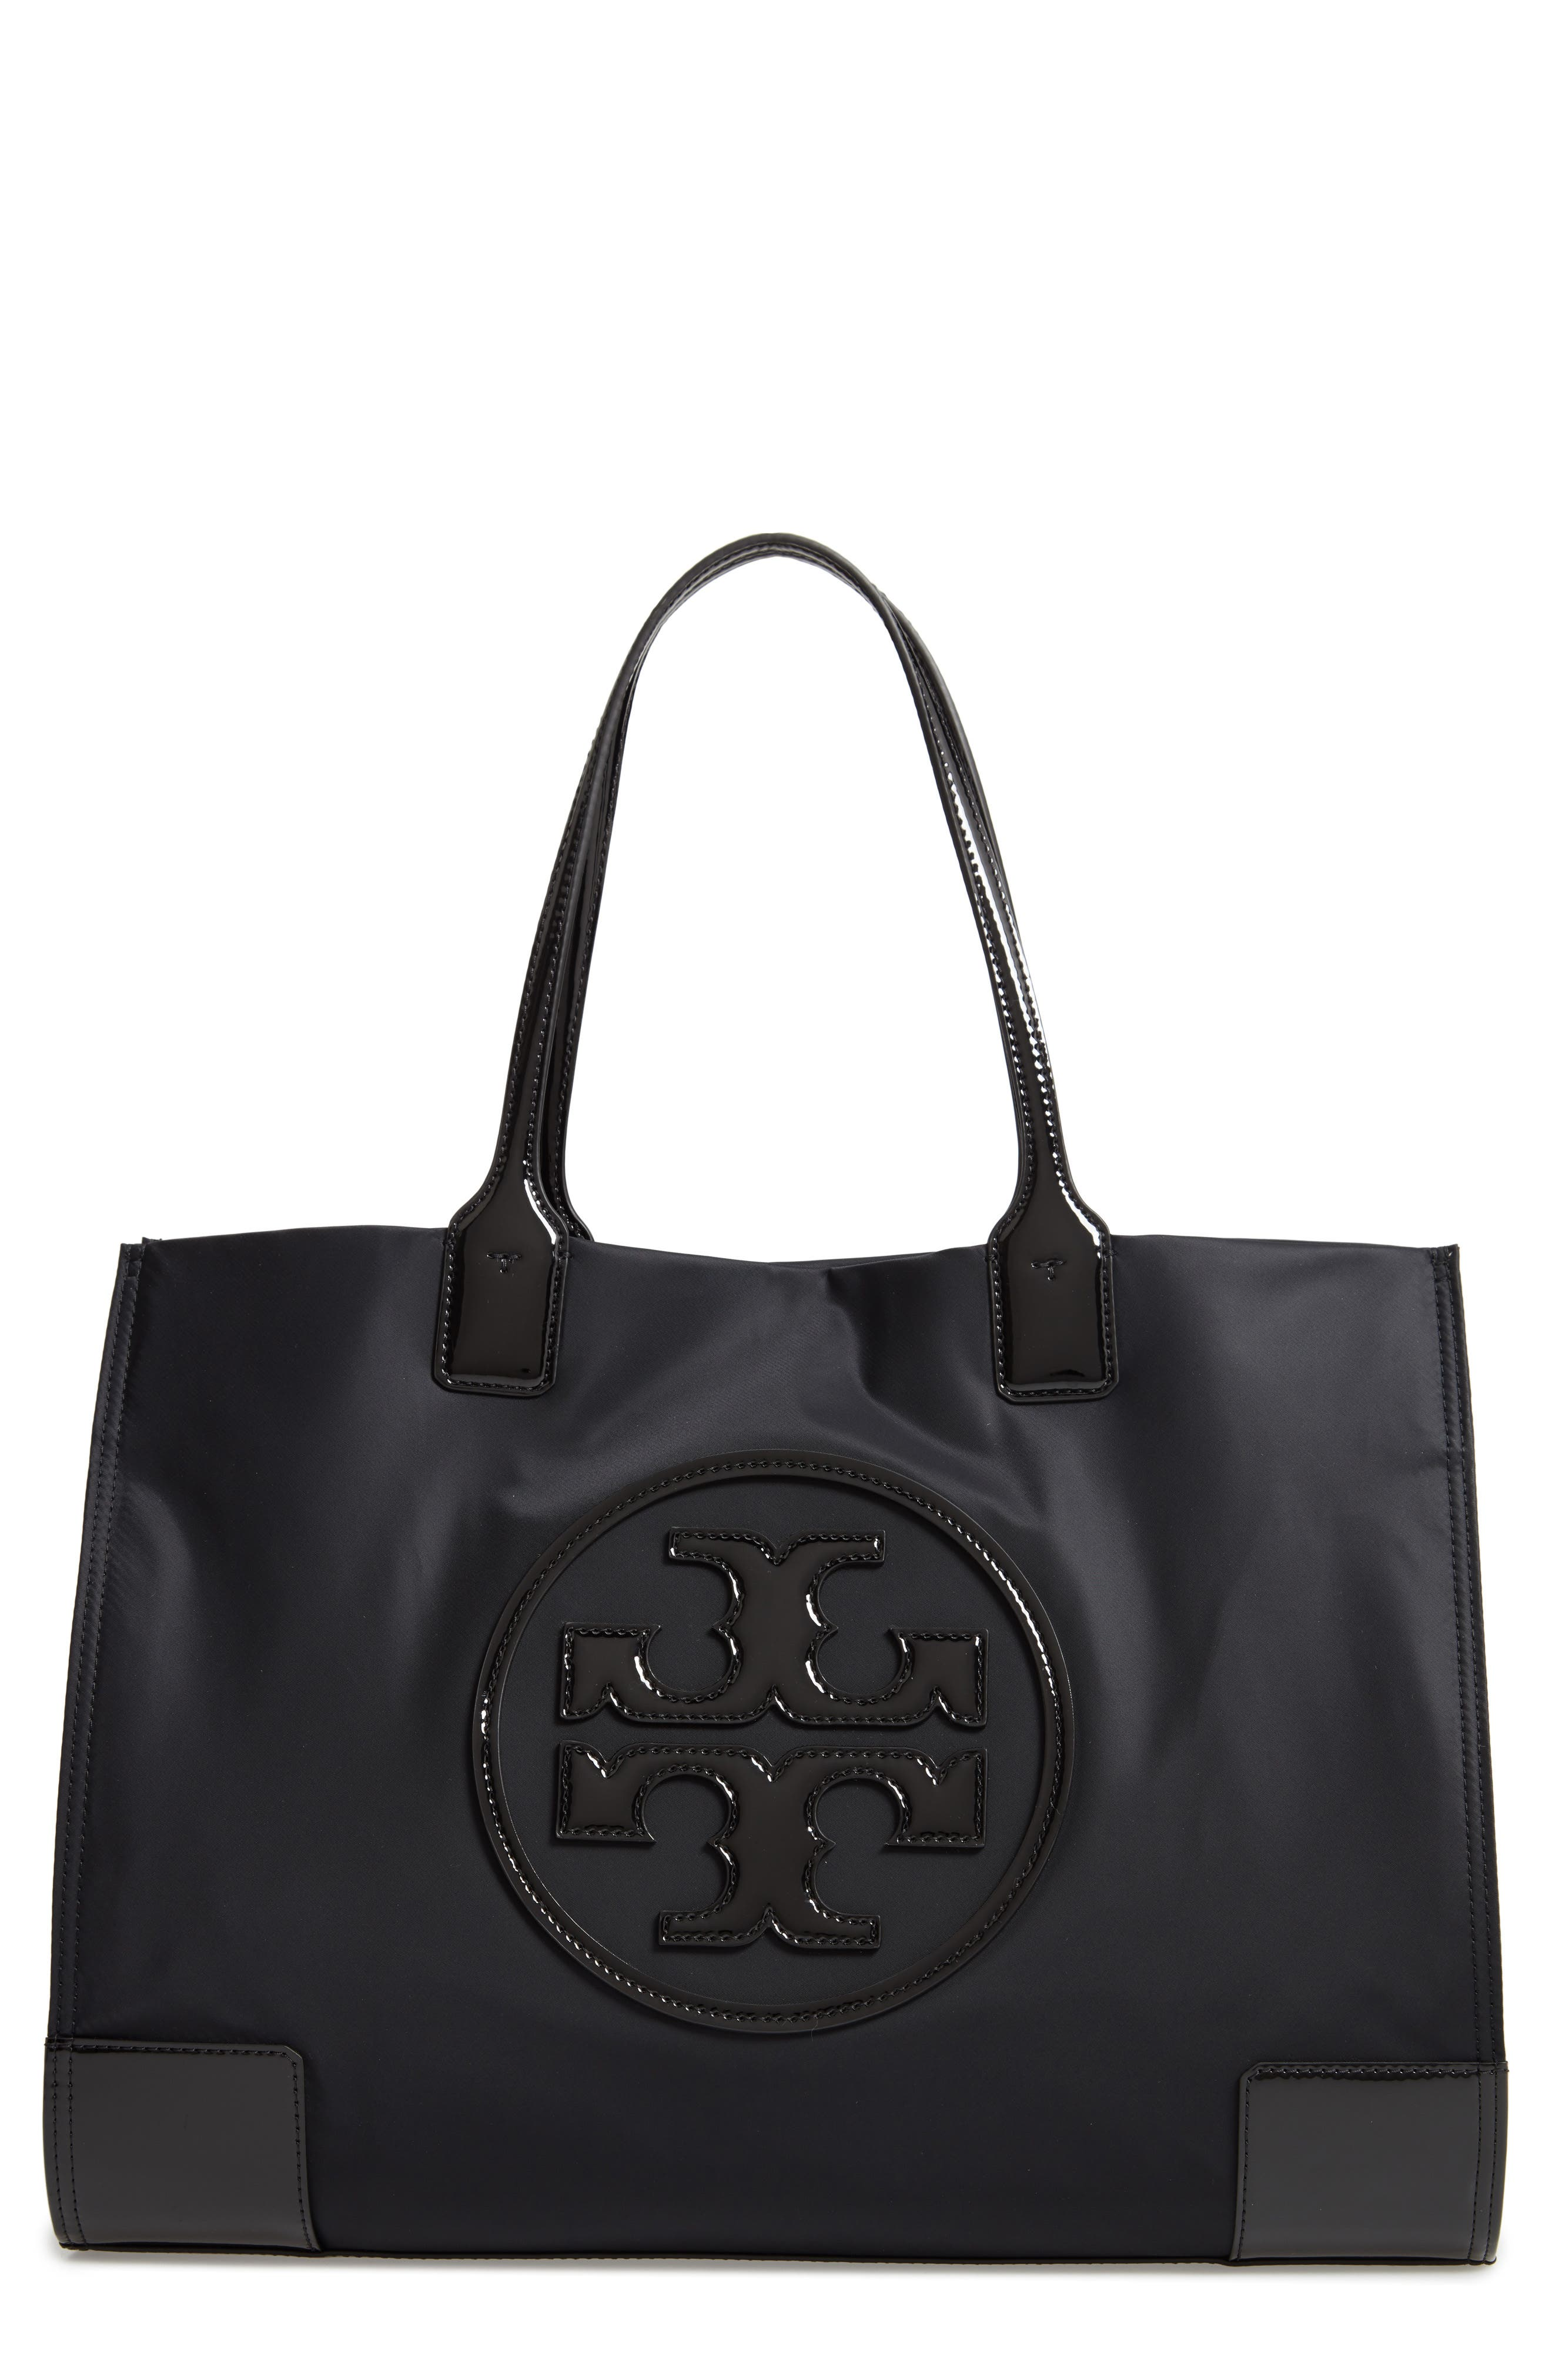 Ella Large Studded Nylon & Leather Tote in Black